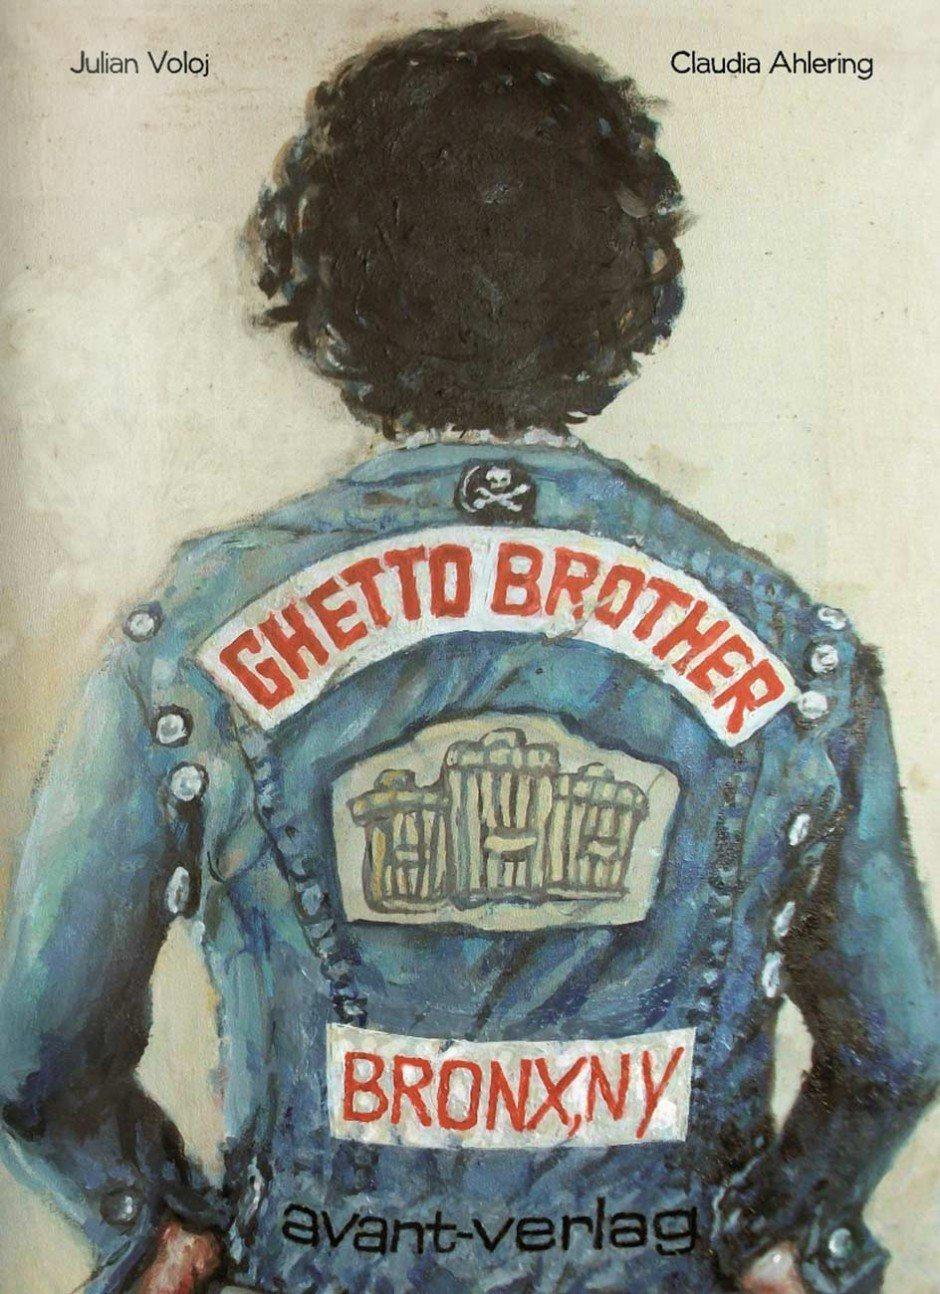 Text: Julian Voloj (Text) und Claudia Ahlering (Zeichnung): Ghetto Brother. BRONX, NY. avant verlag, 128 Seiten. 19,95 Euro. 978-3-945034-19-4